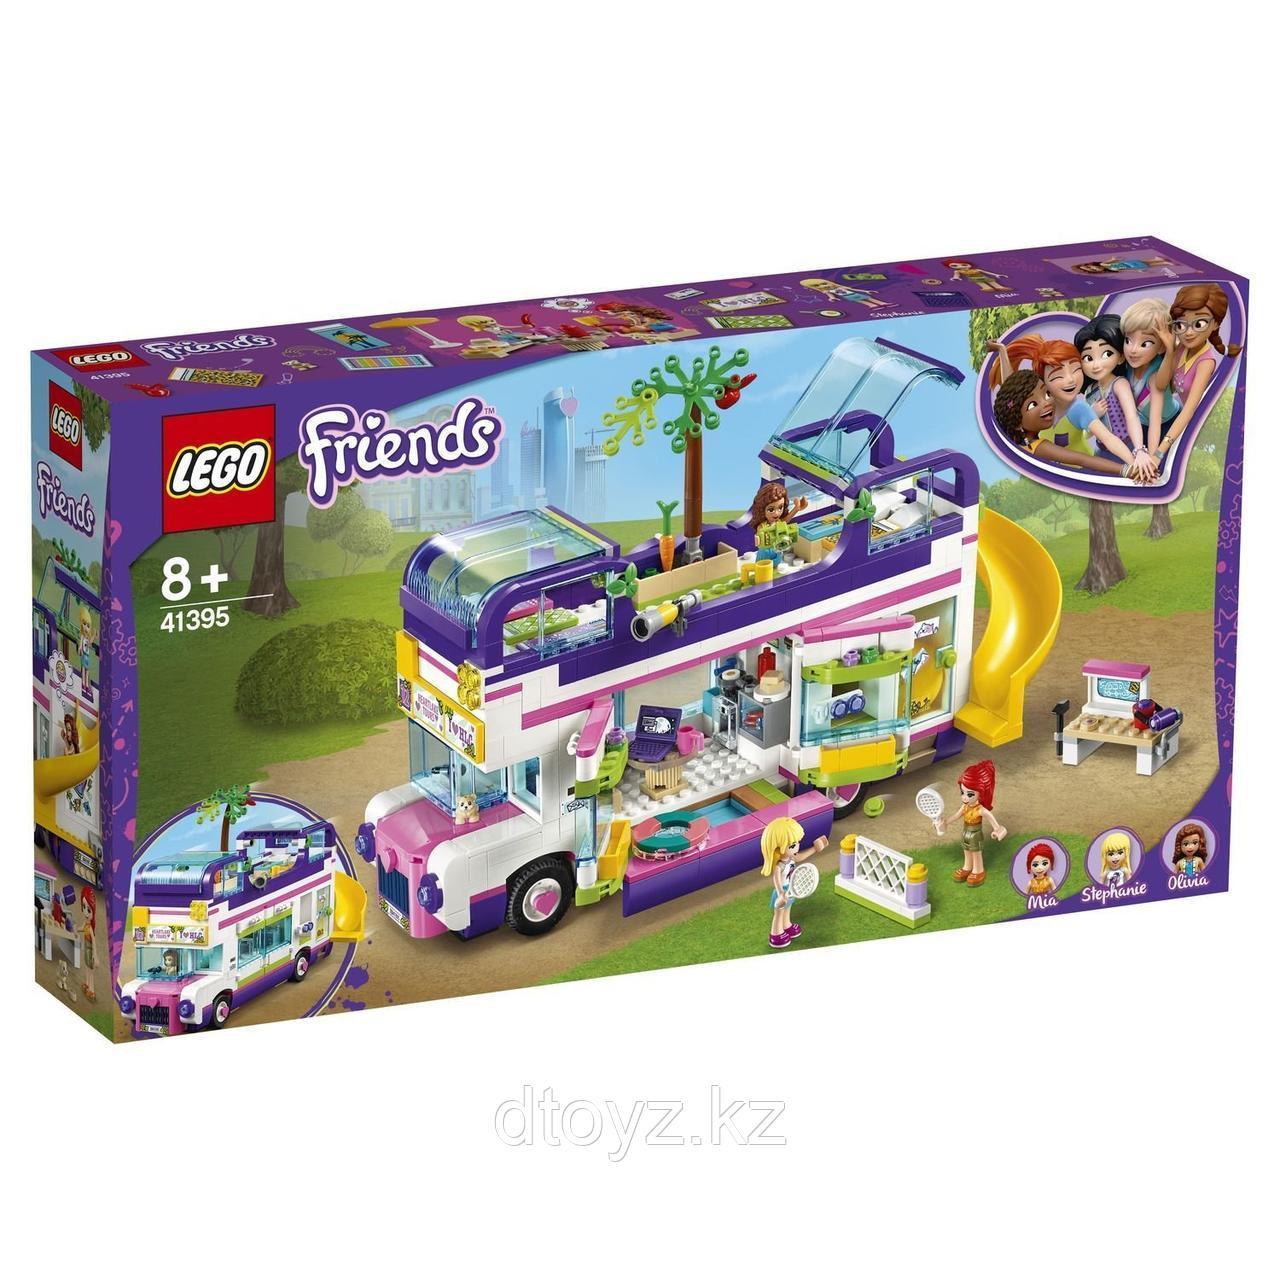 Lego Friends 41395 Автобус для друзей  Хартлейк Сити